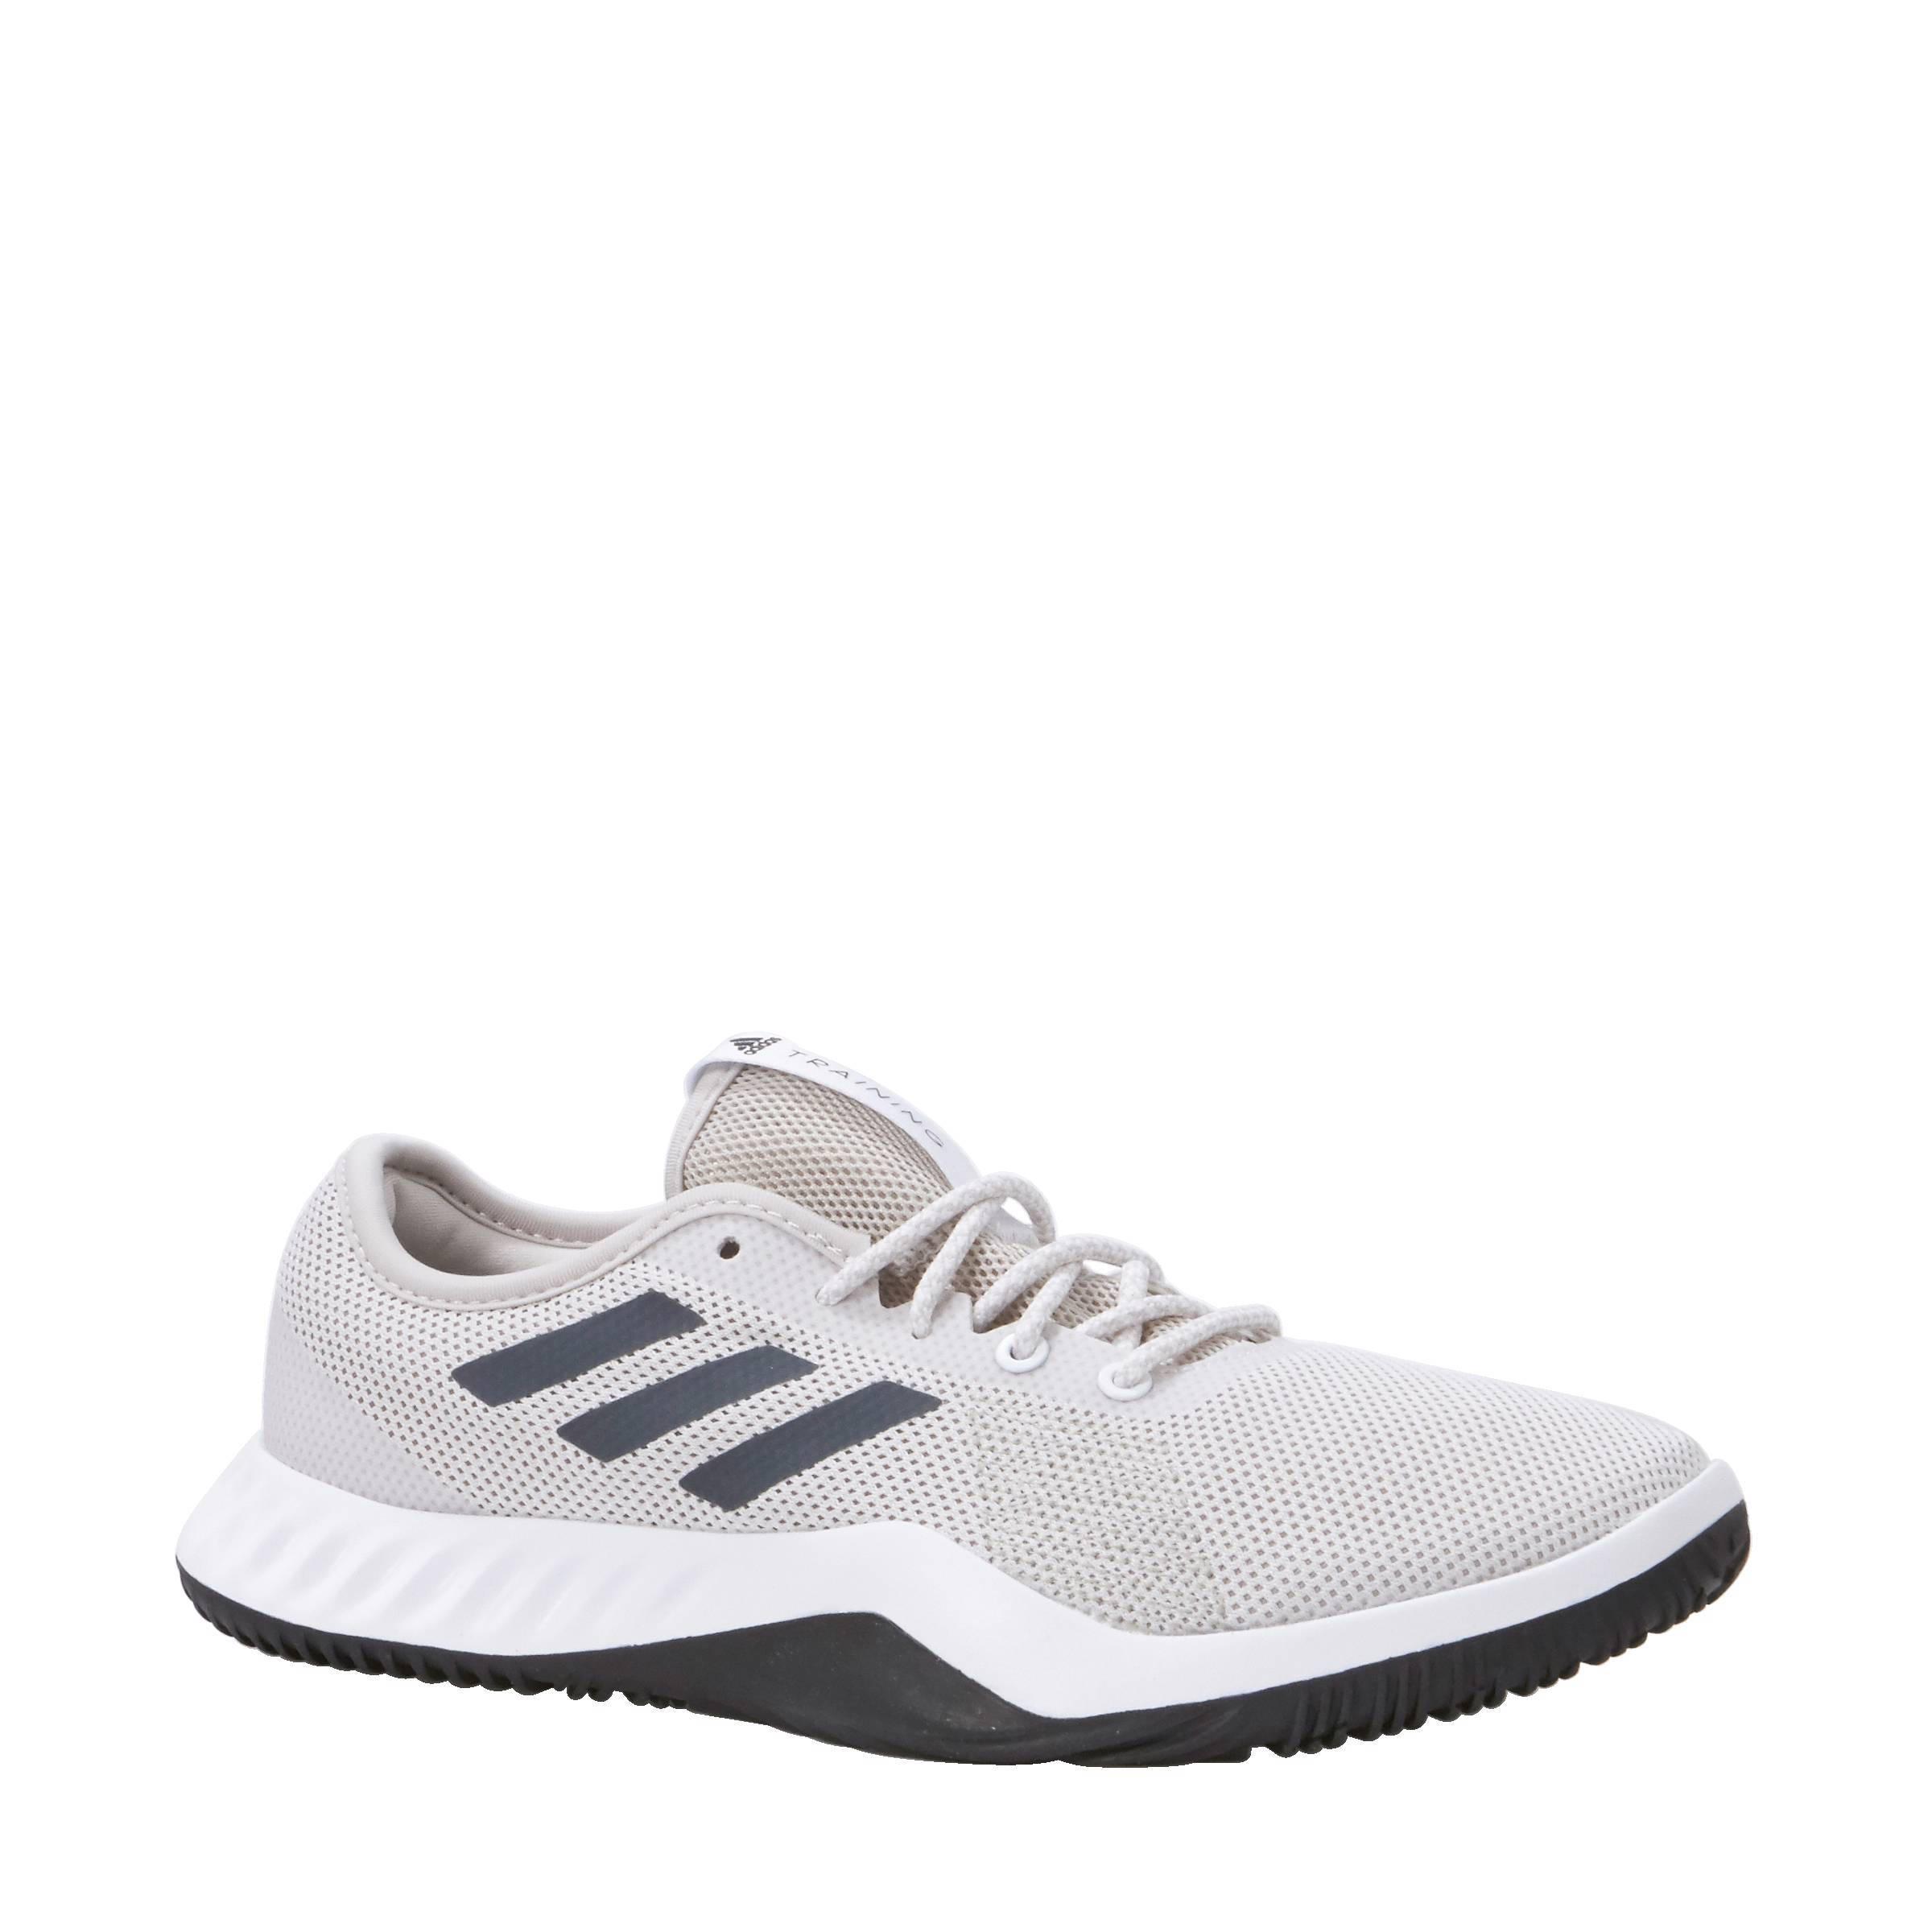 adidas performance Crazy Train LT M fitness schoenen | wehkamp